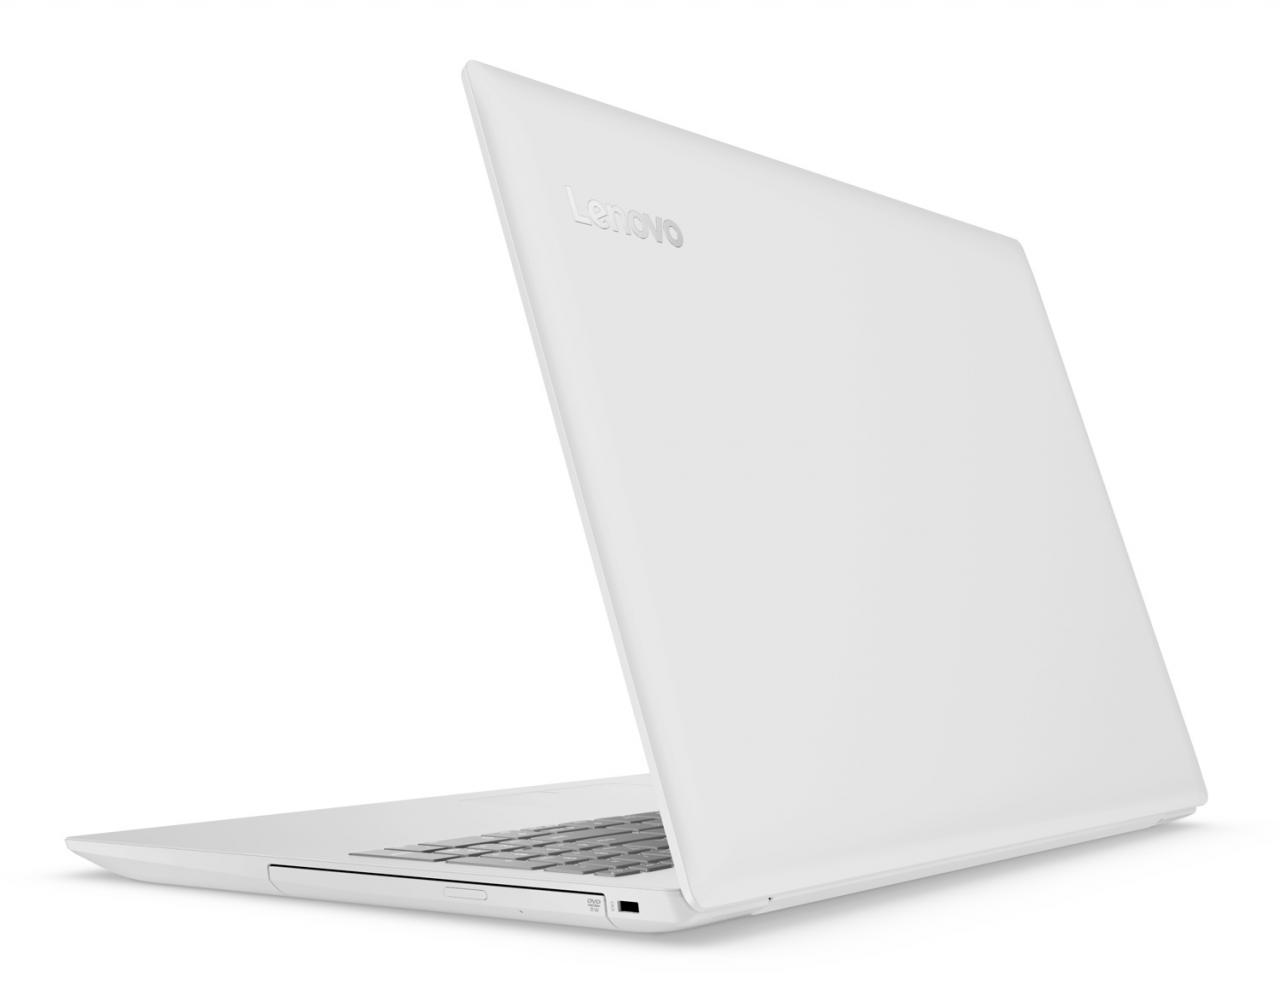 Lenovo IdeaPad 320-15IKBN Specs and Details